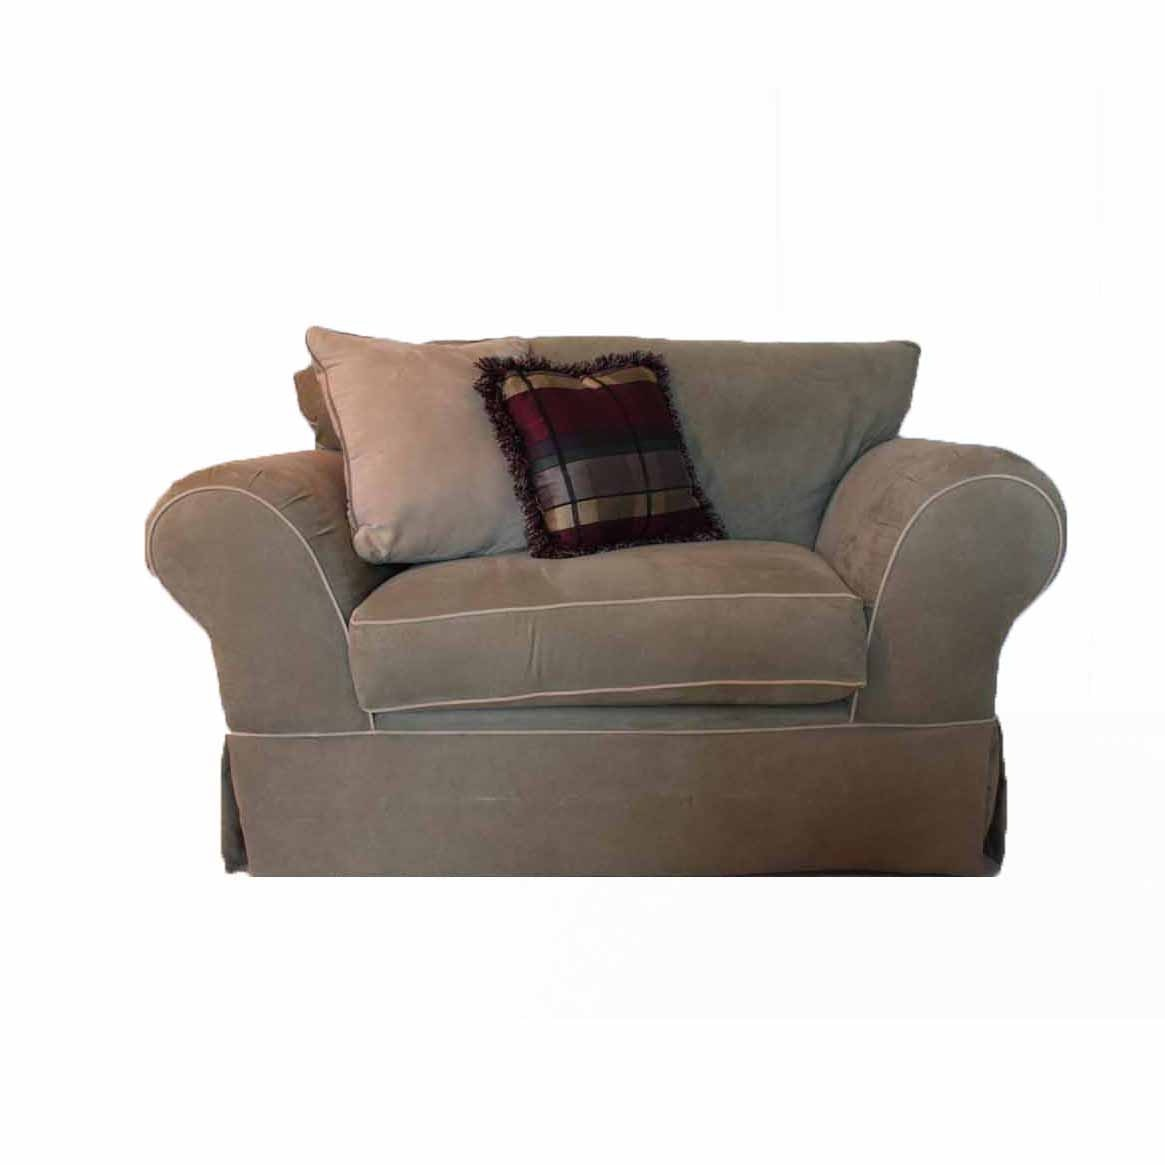 Sofa Express Oversized Lounge Chair EBTH